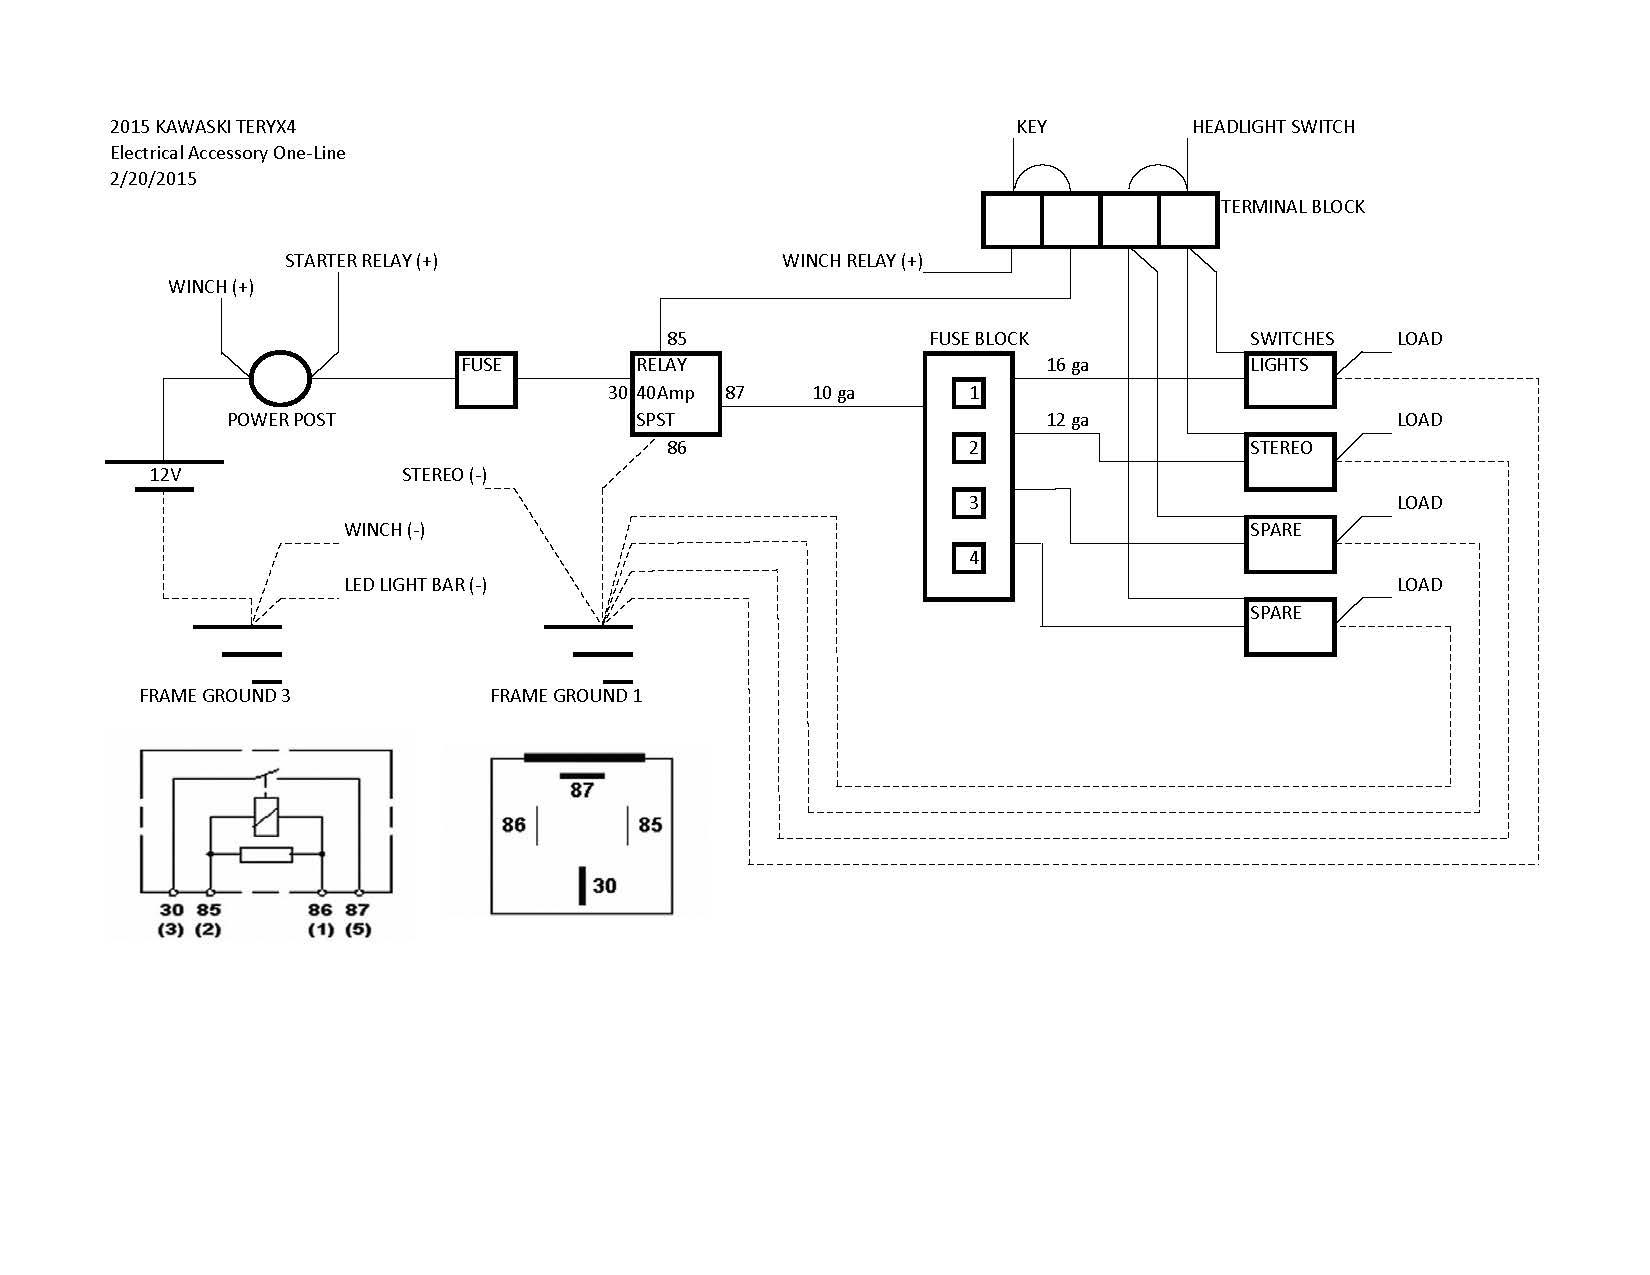 2008 Kawasaki Teryx Fan Wiring Diagram